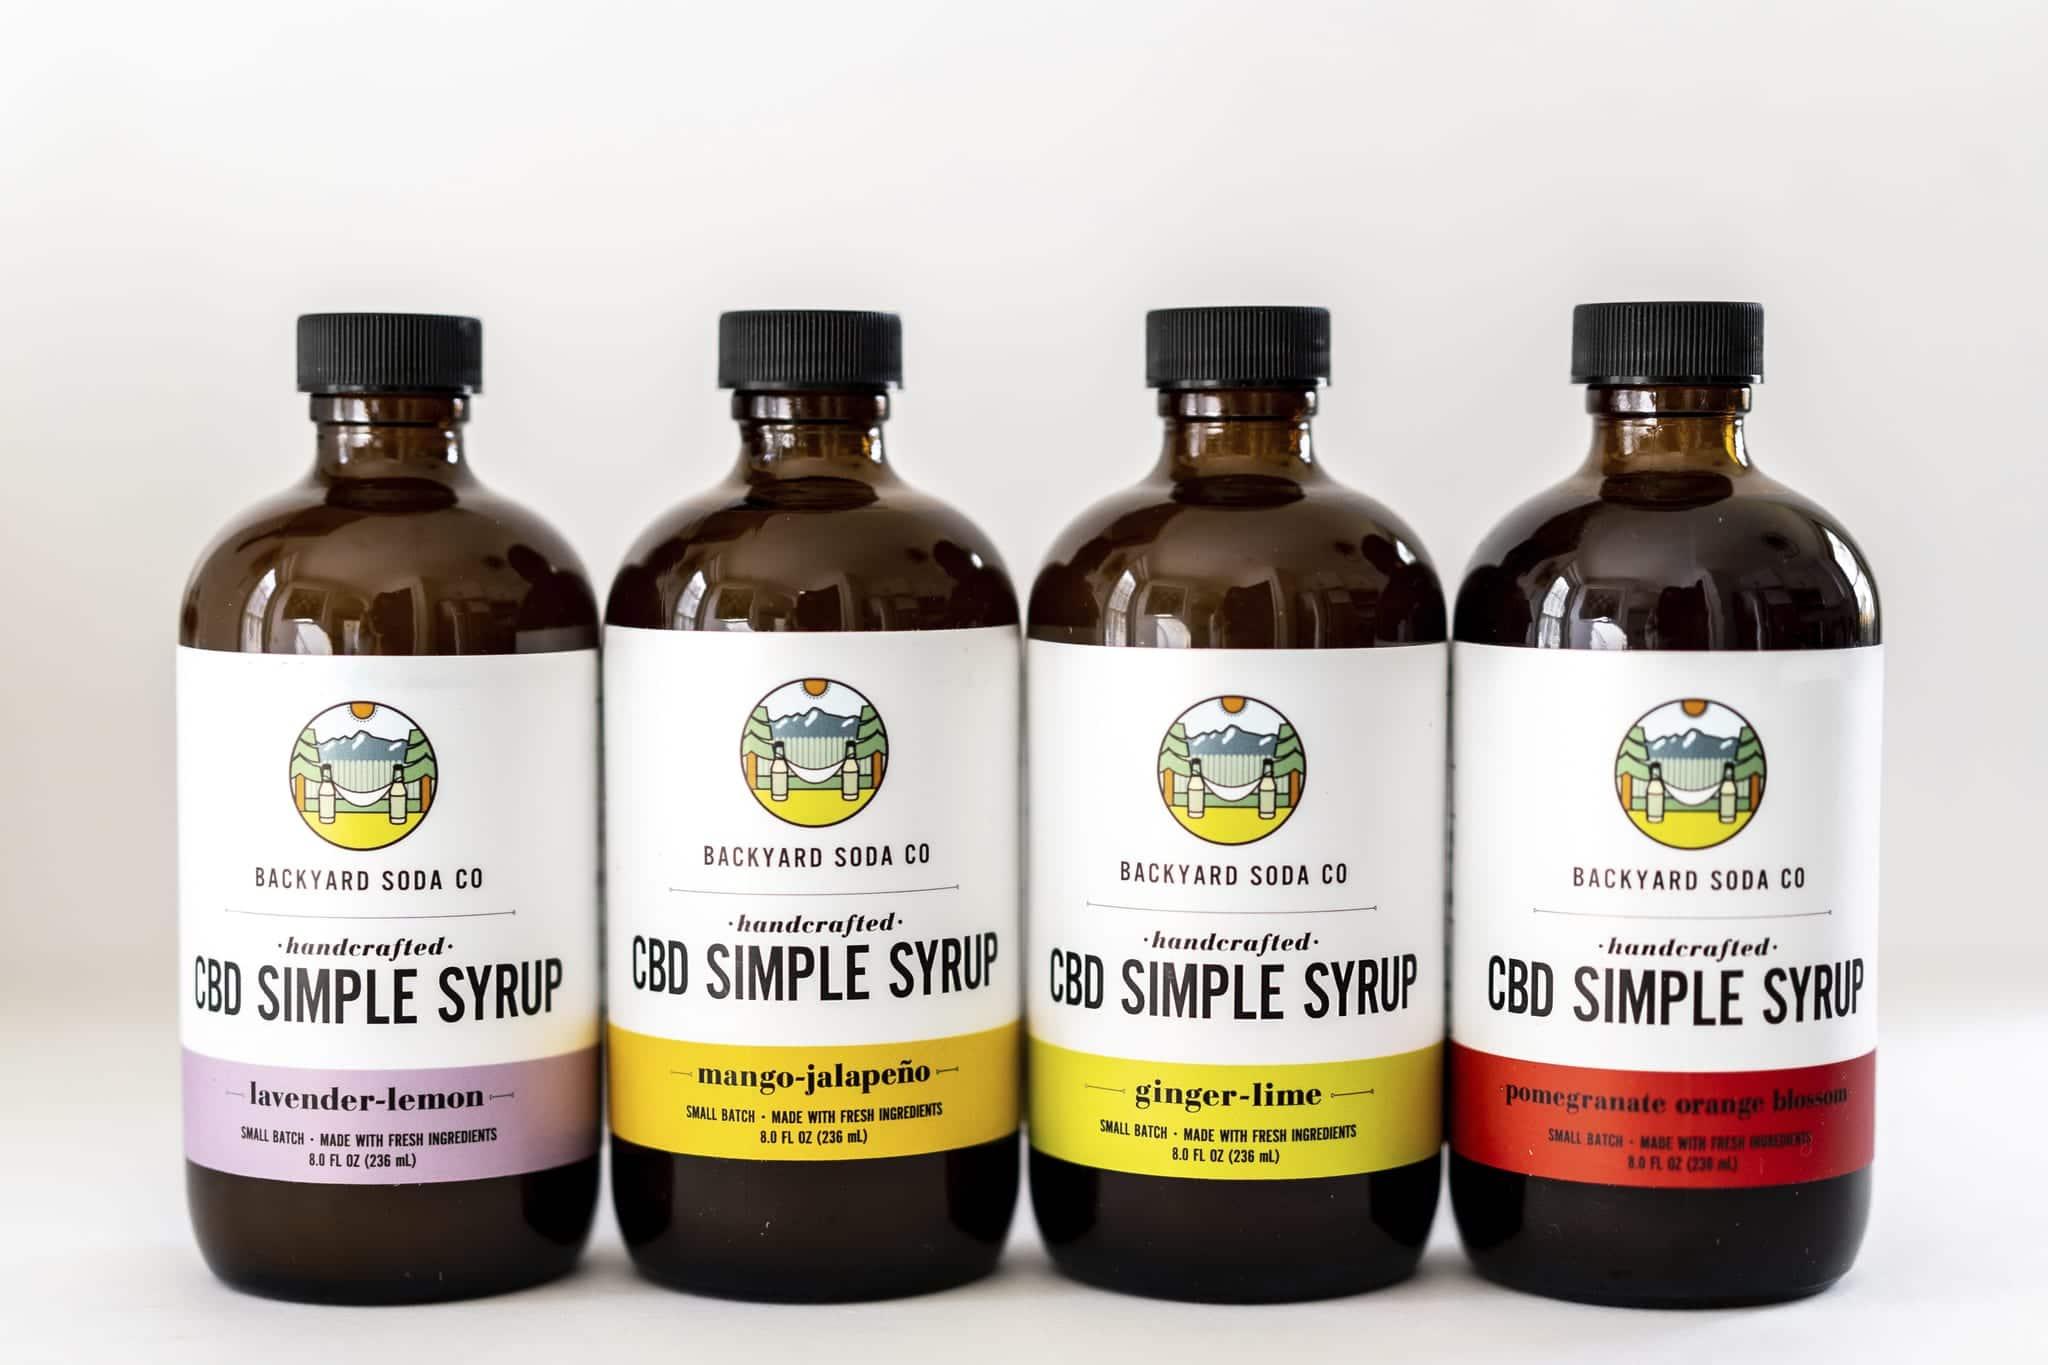 CBD Simple Syrup by Backyard Soda Co.